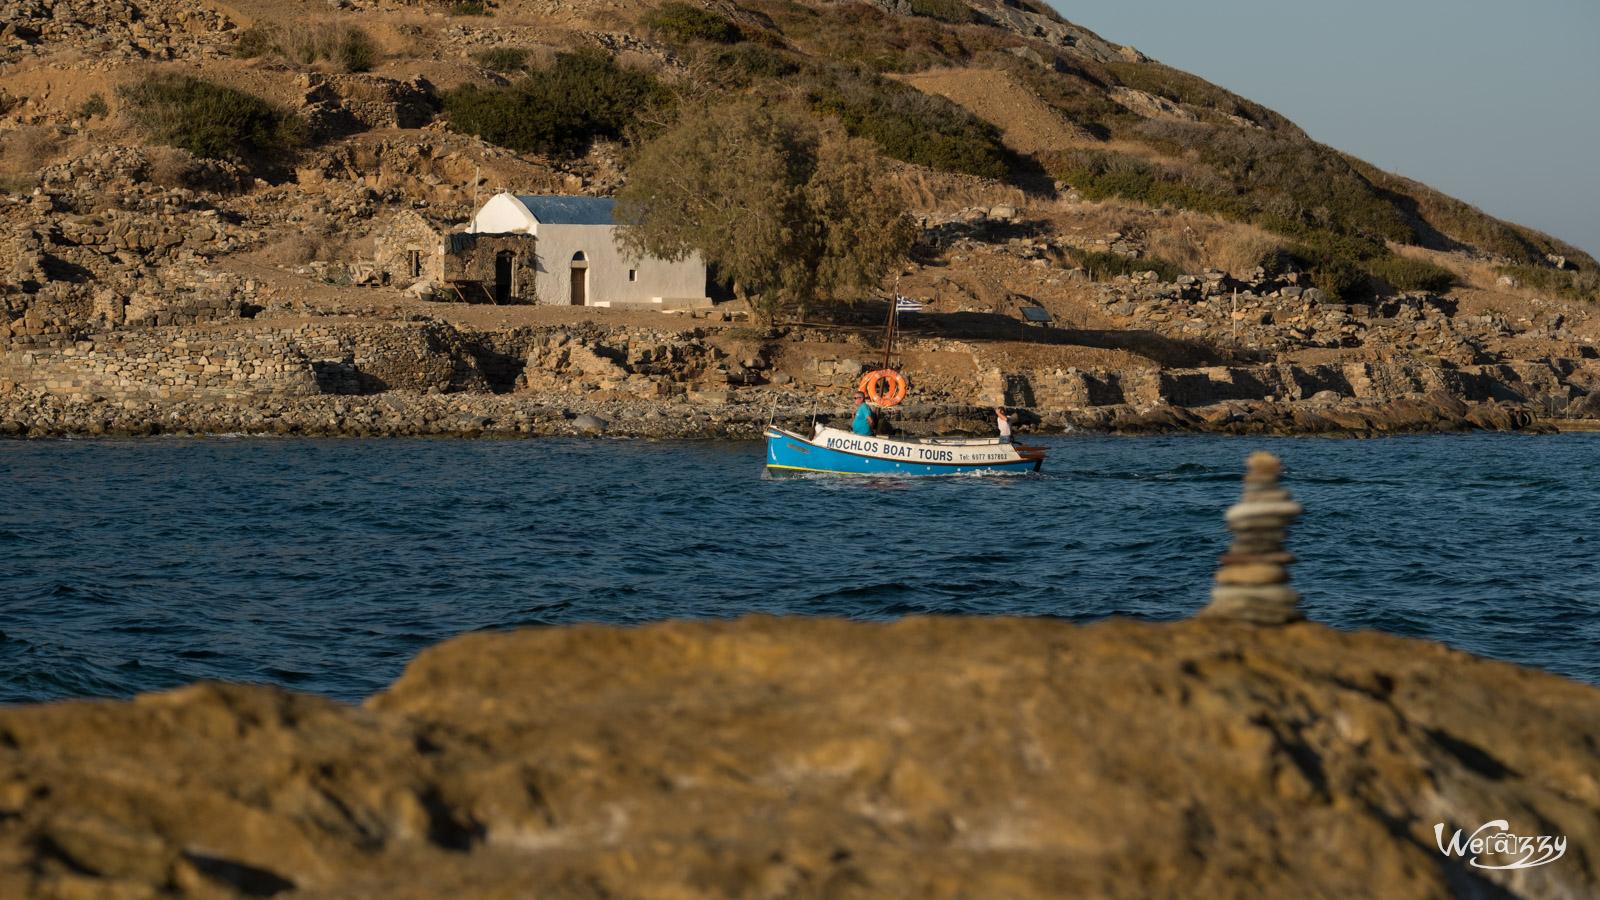 Crete, Mochlos, road-trip